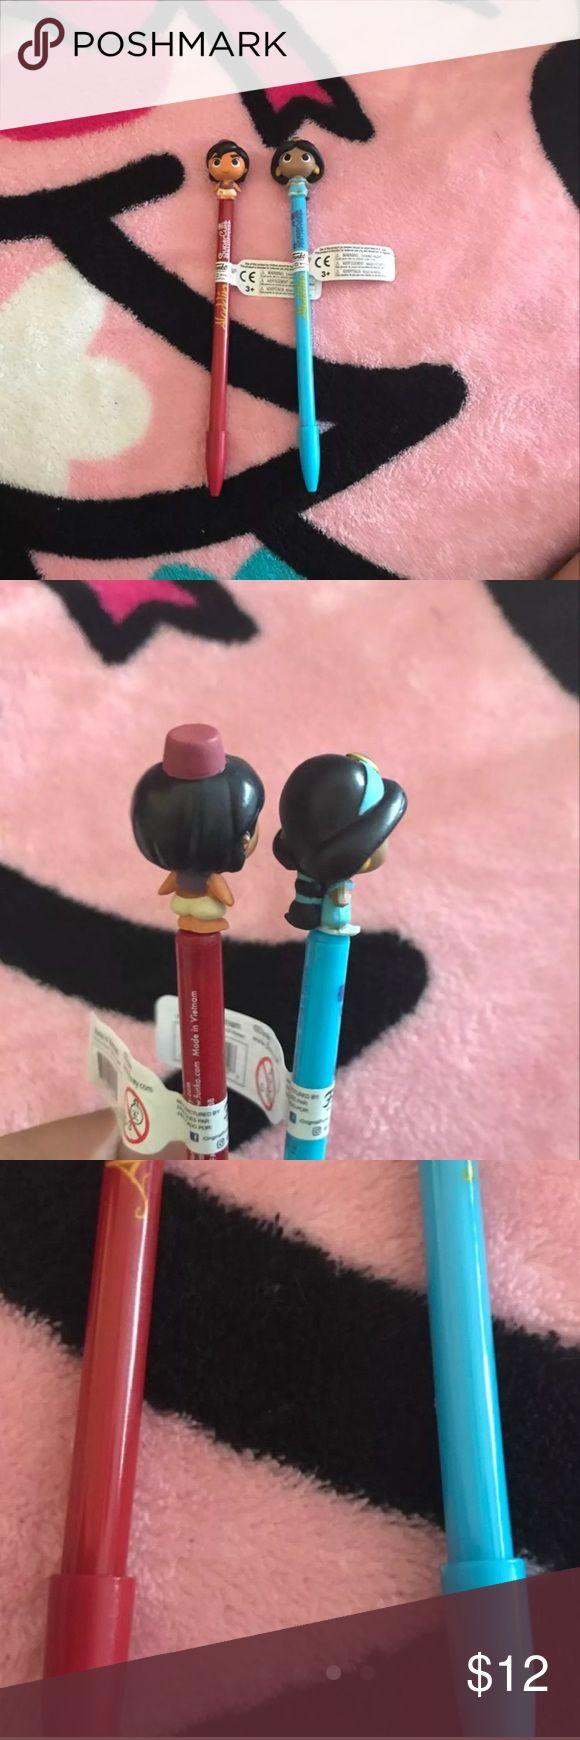 Disney ALLADIN SuperCute Funko Pop Pens BRAND NEW NEVER USED No TRADES Price is Firm Accessories